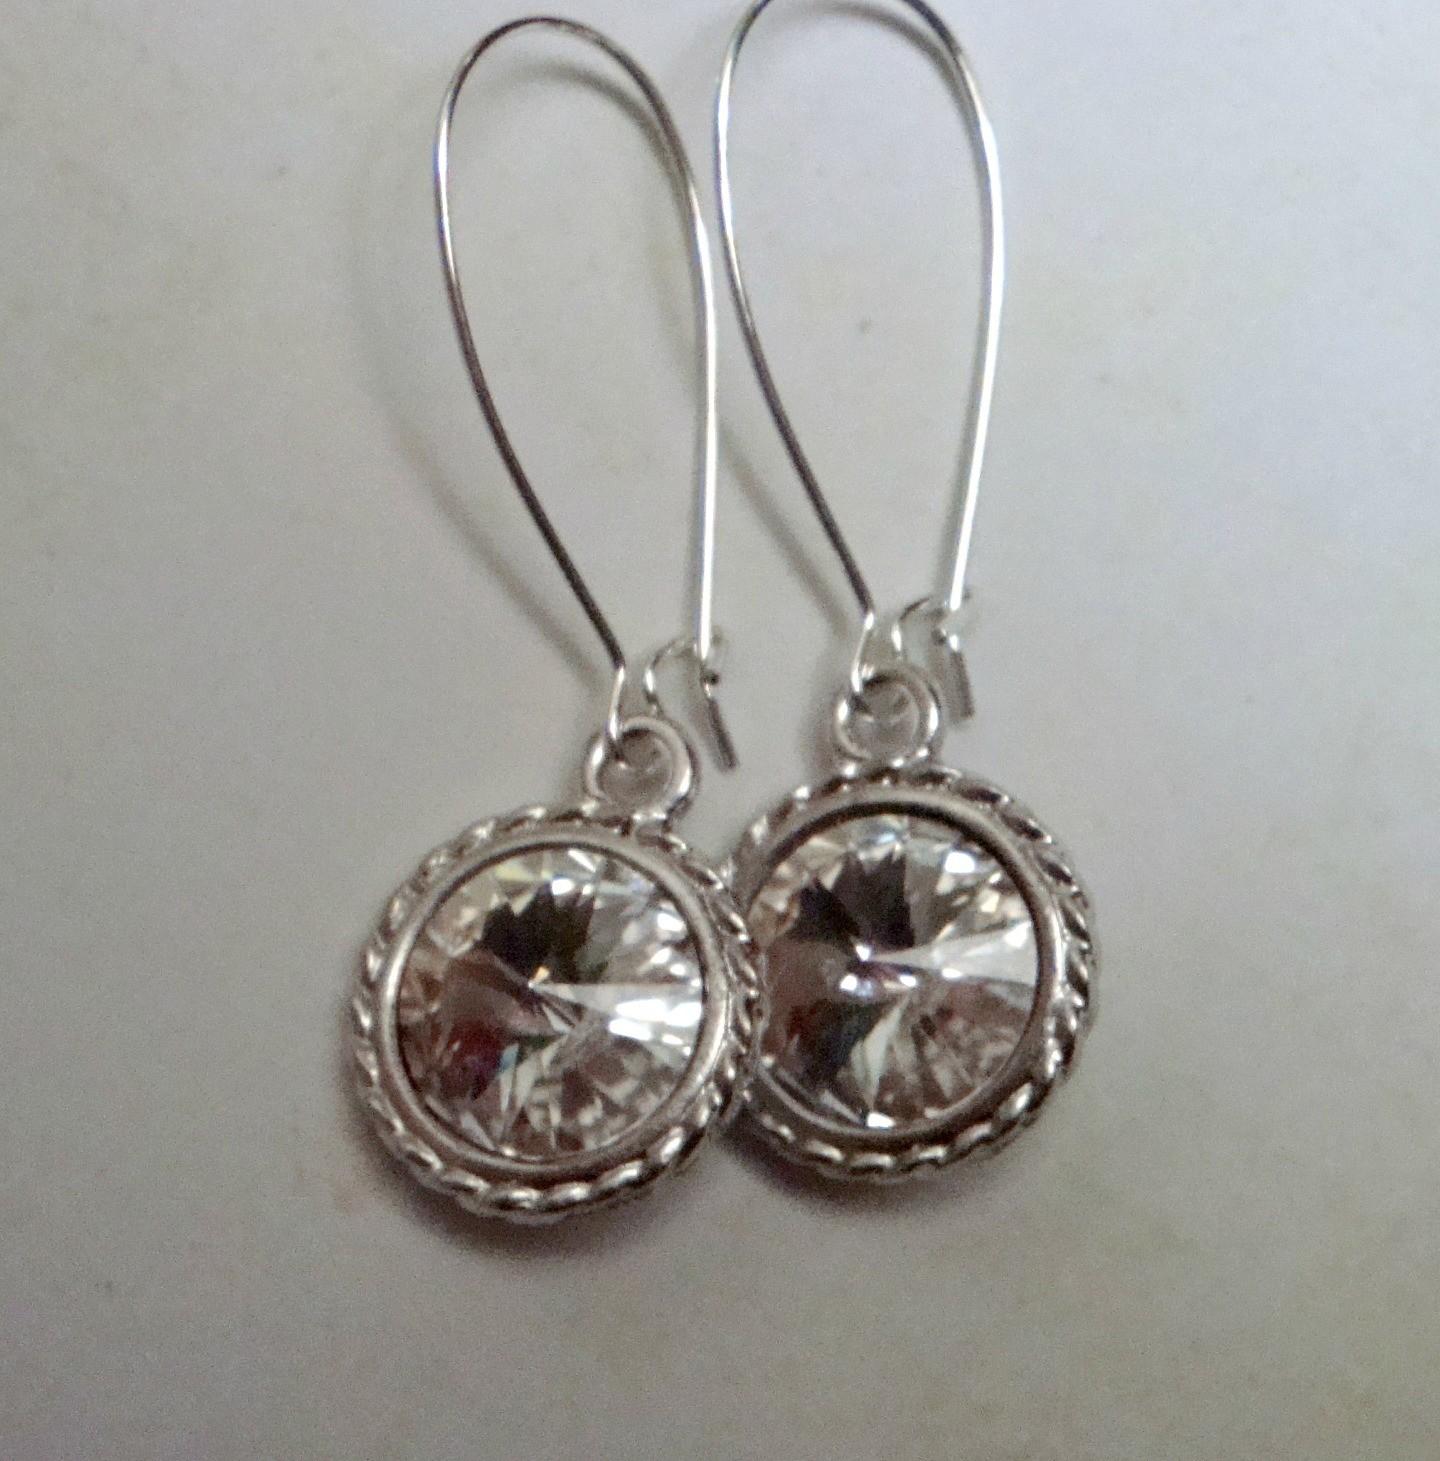 Calypso Bridal Earrings